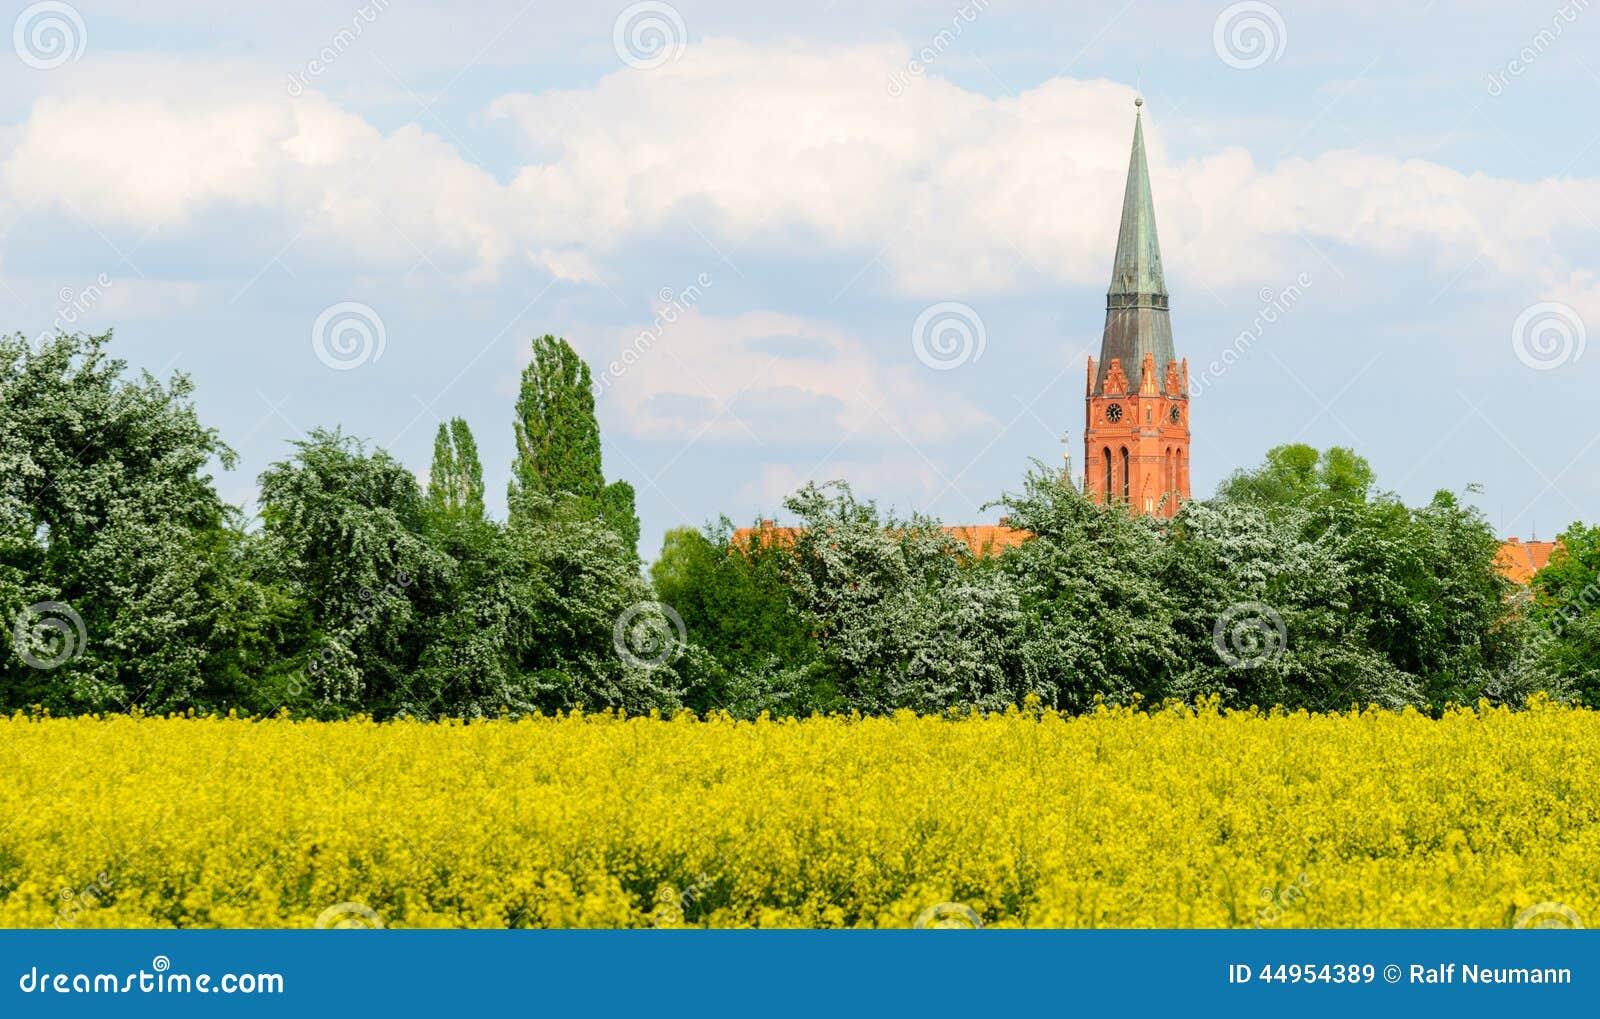 Tower of St. Martin in Nienburg